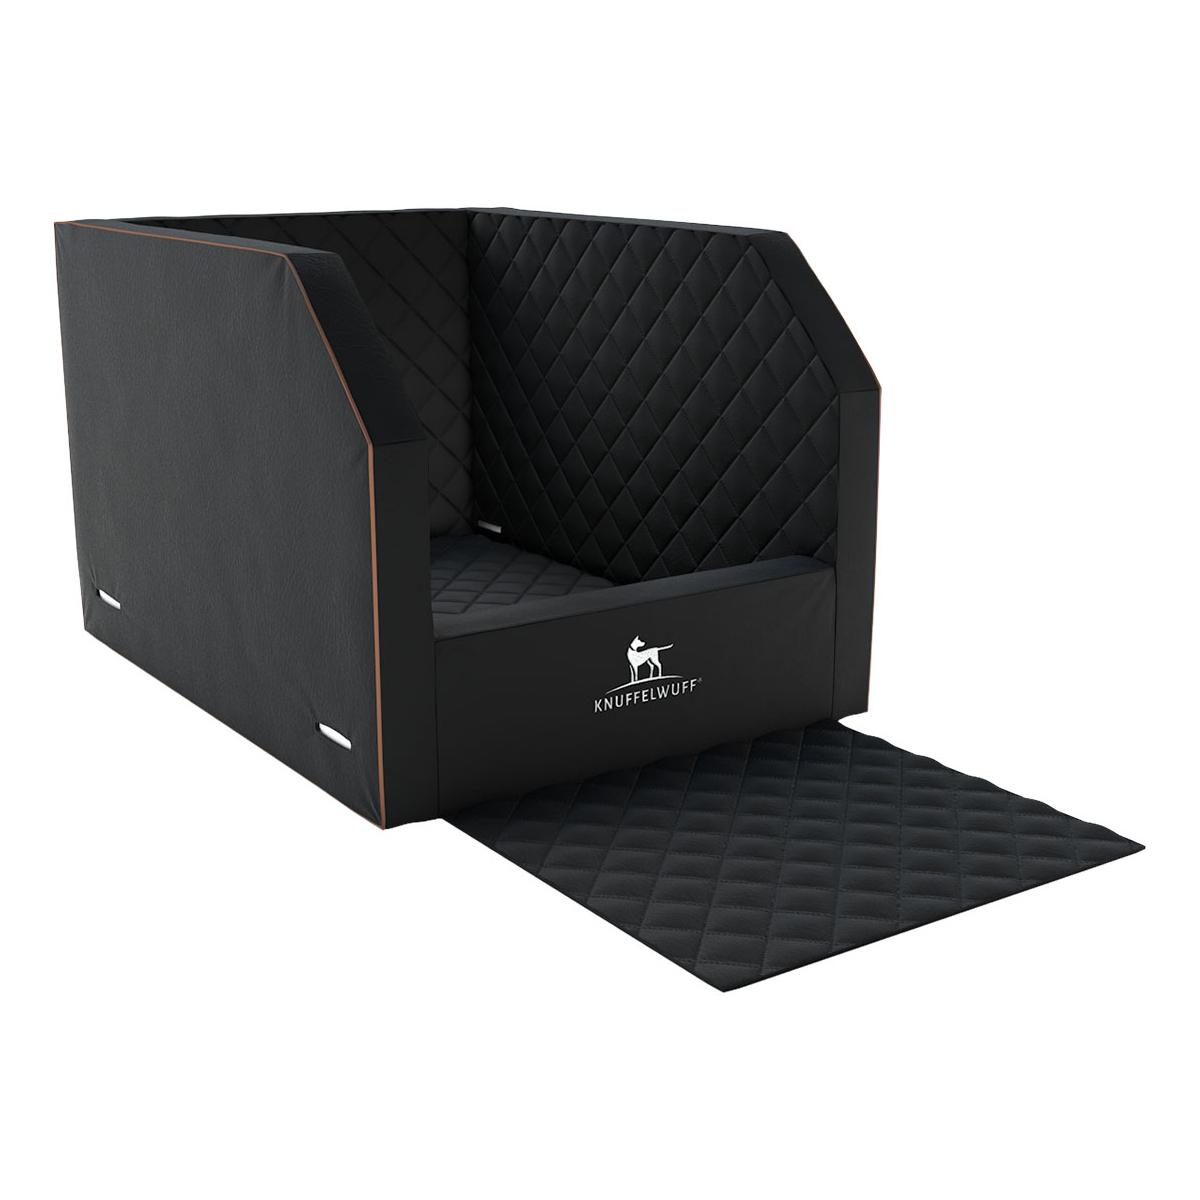 knuffelwuff cargo hundebox auto hunde autositz hundetransportbox tran 169 95. Black Bedroom Furniture Sets. Home Design Ideas